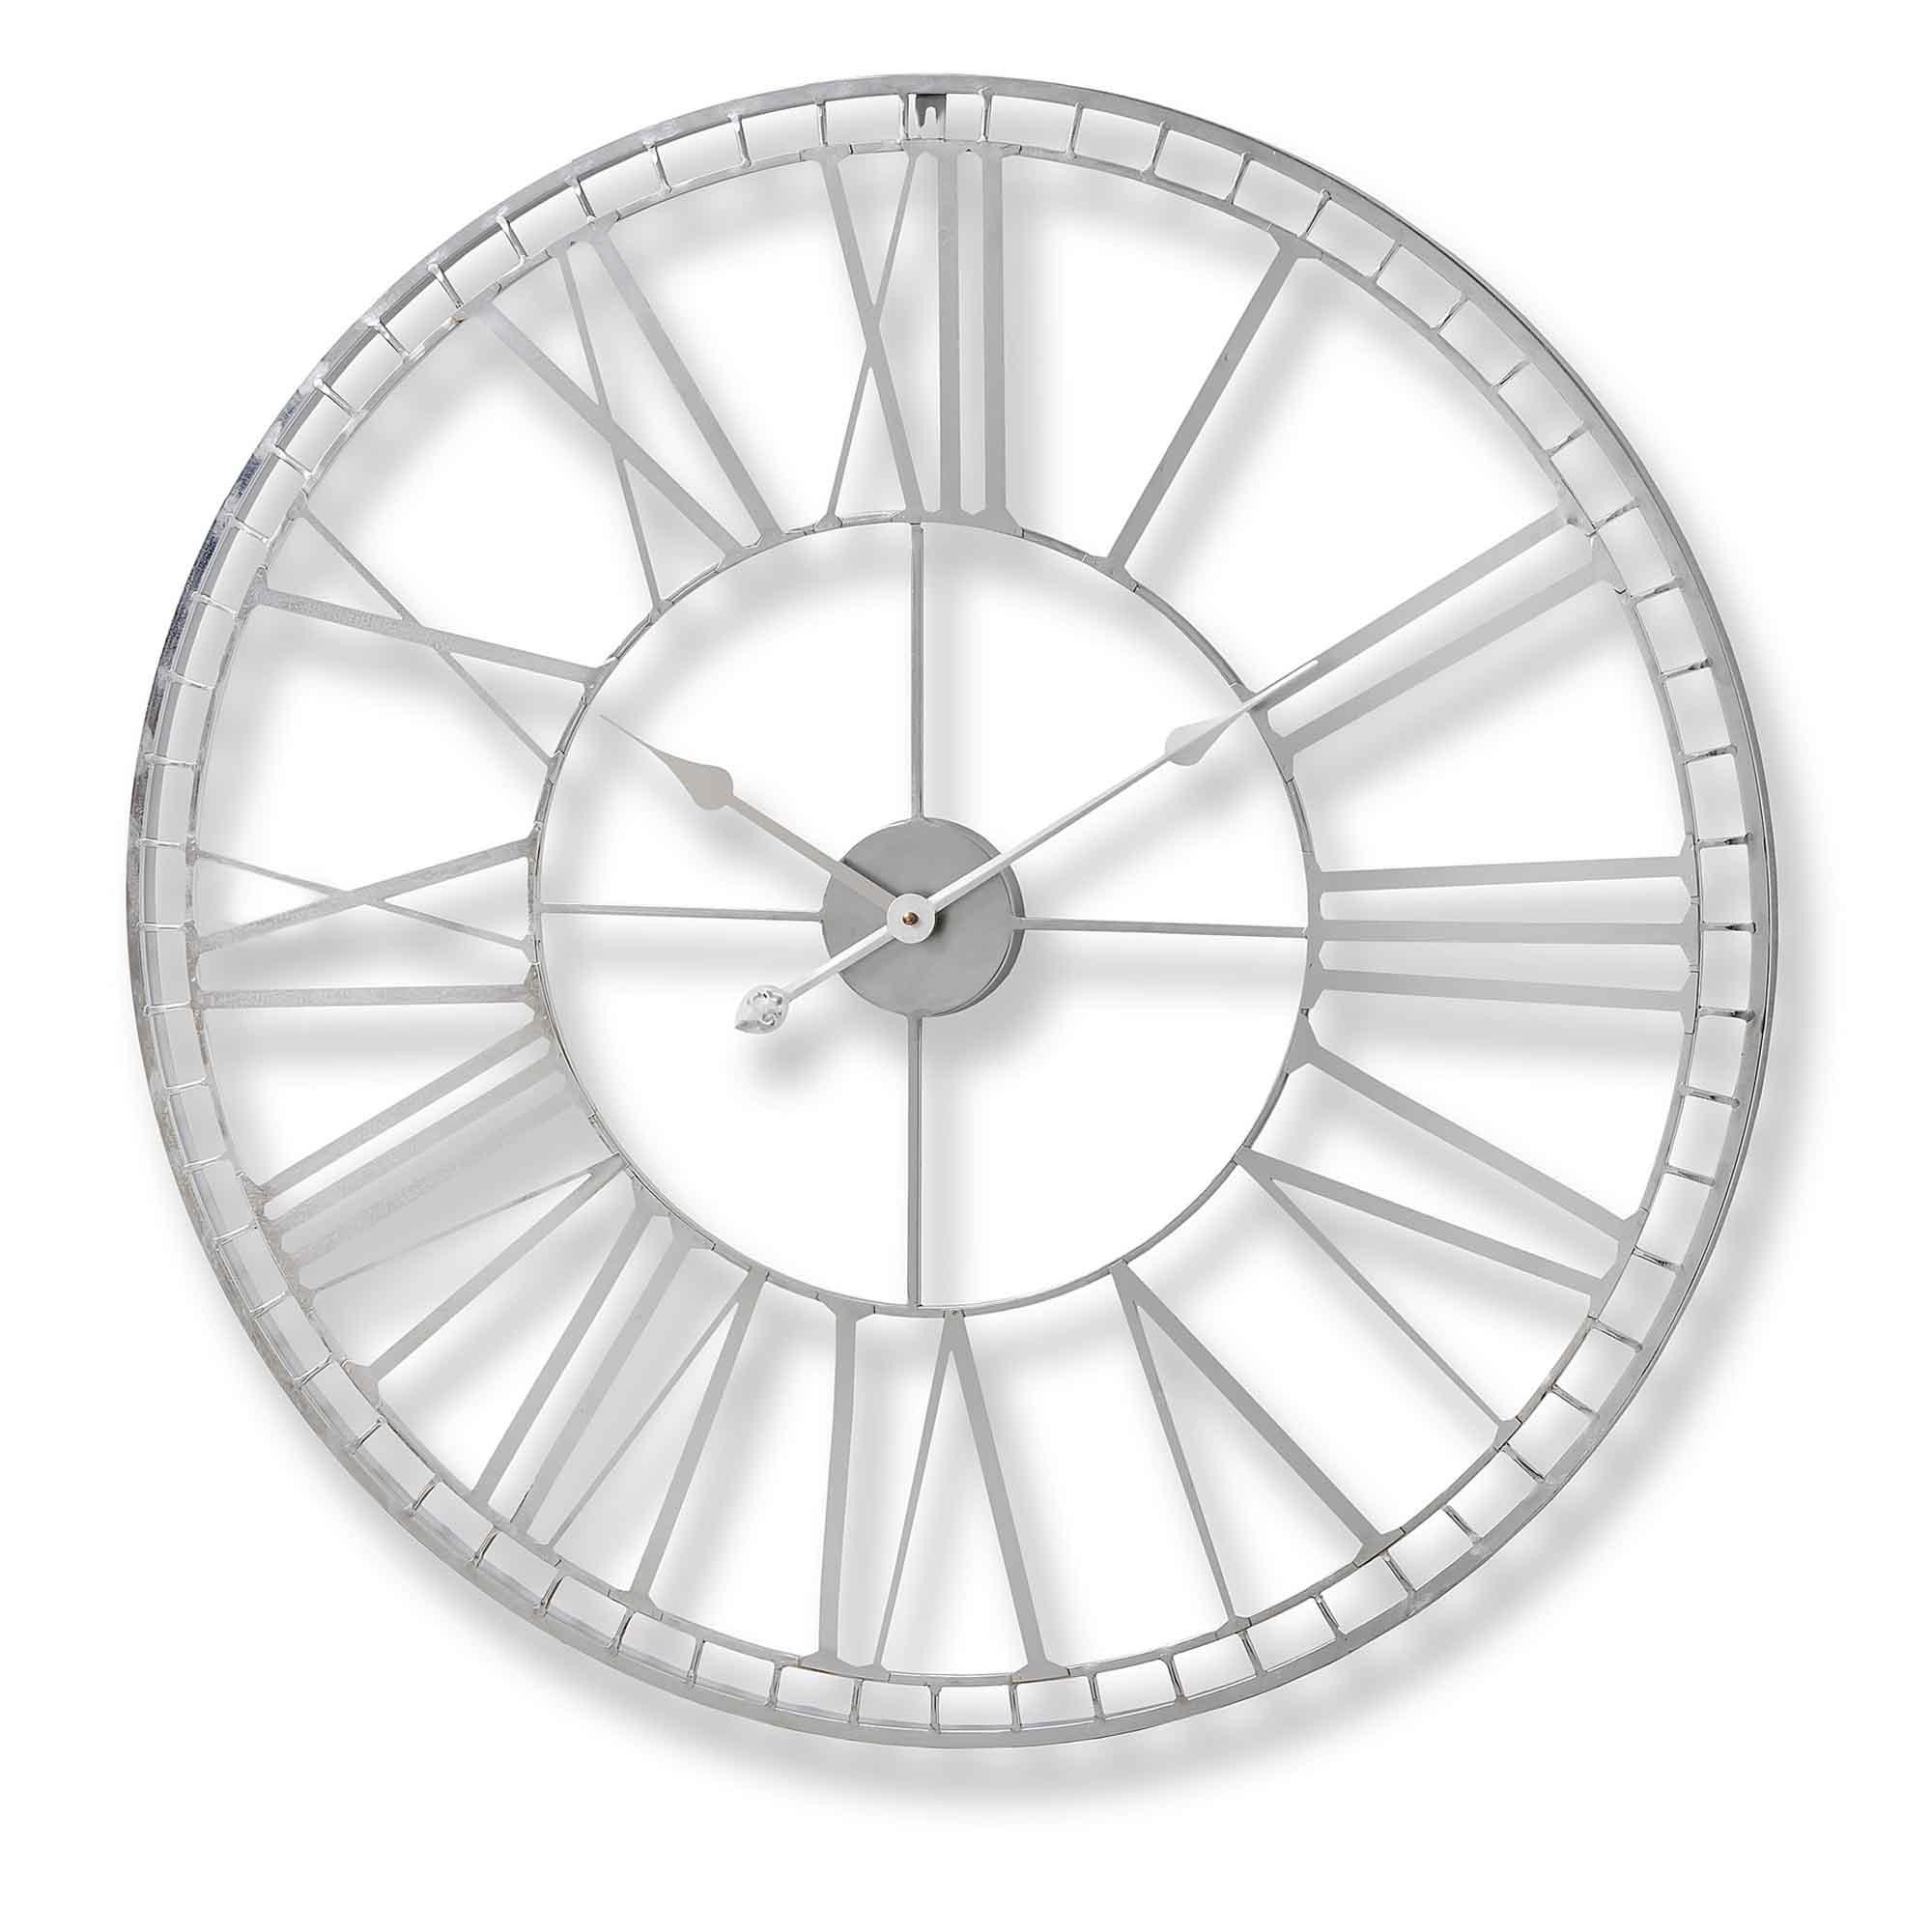 Nickel Frame Round Wall Clock Clock Homesdirect365